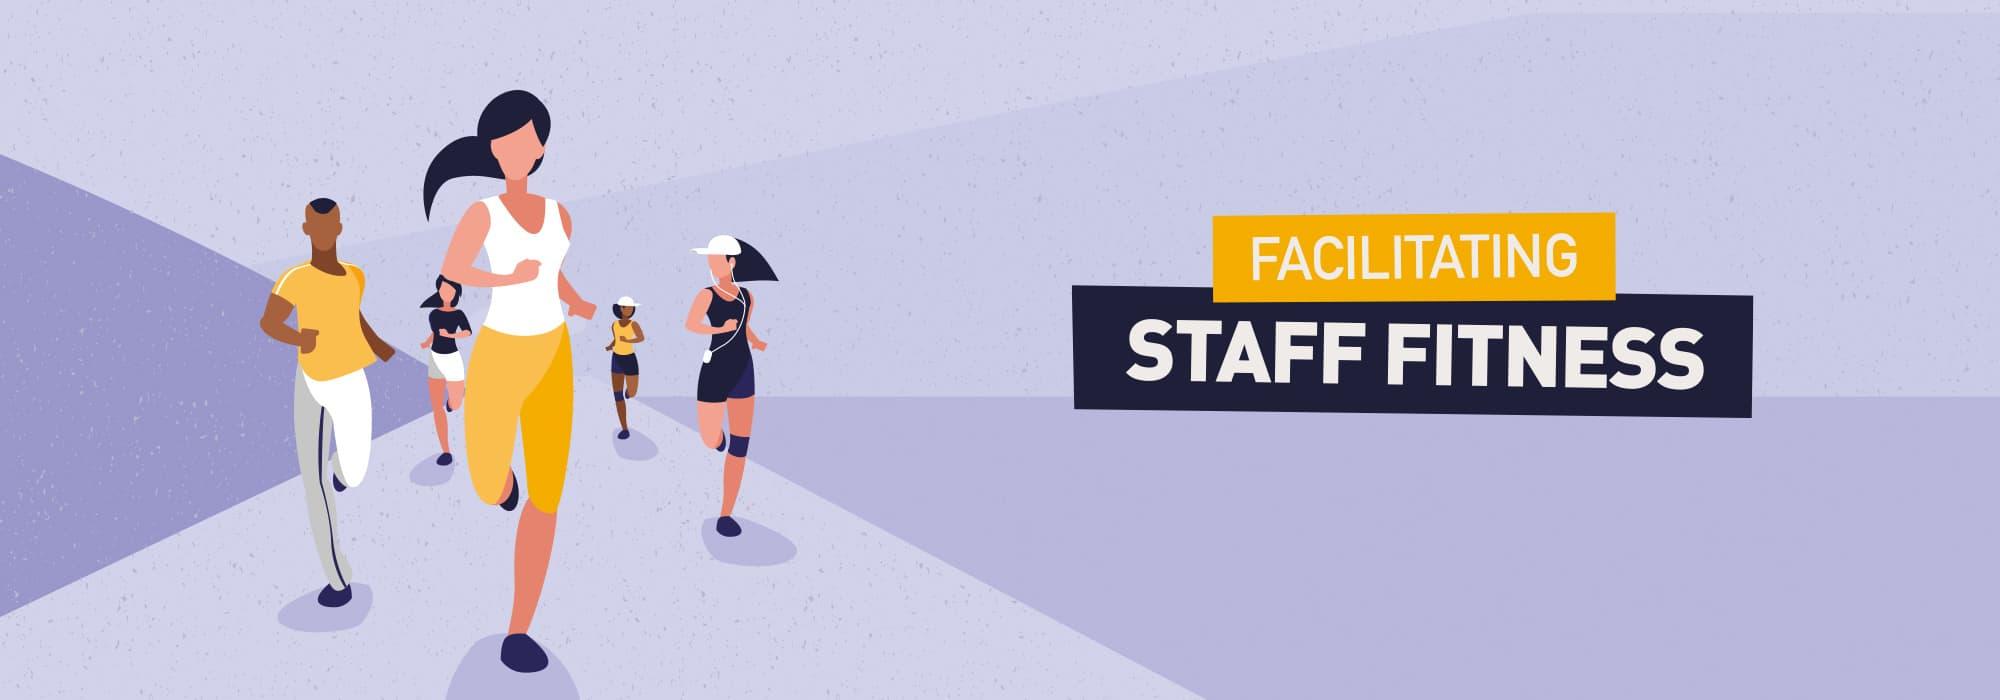 Facilitating Staff Fitness